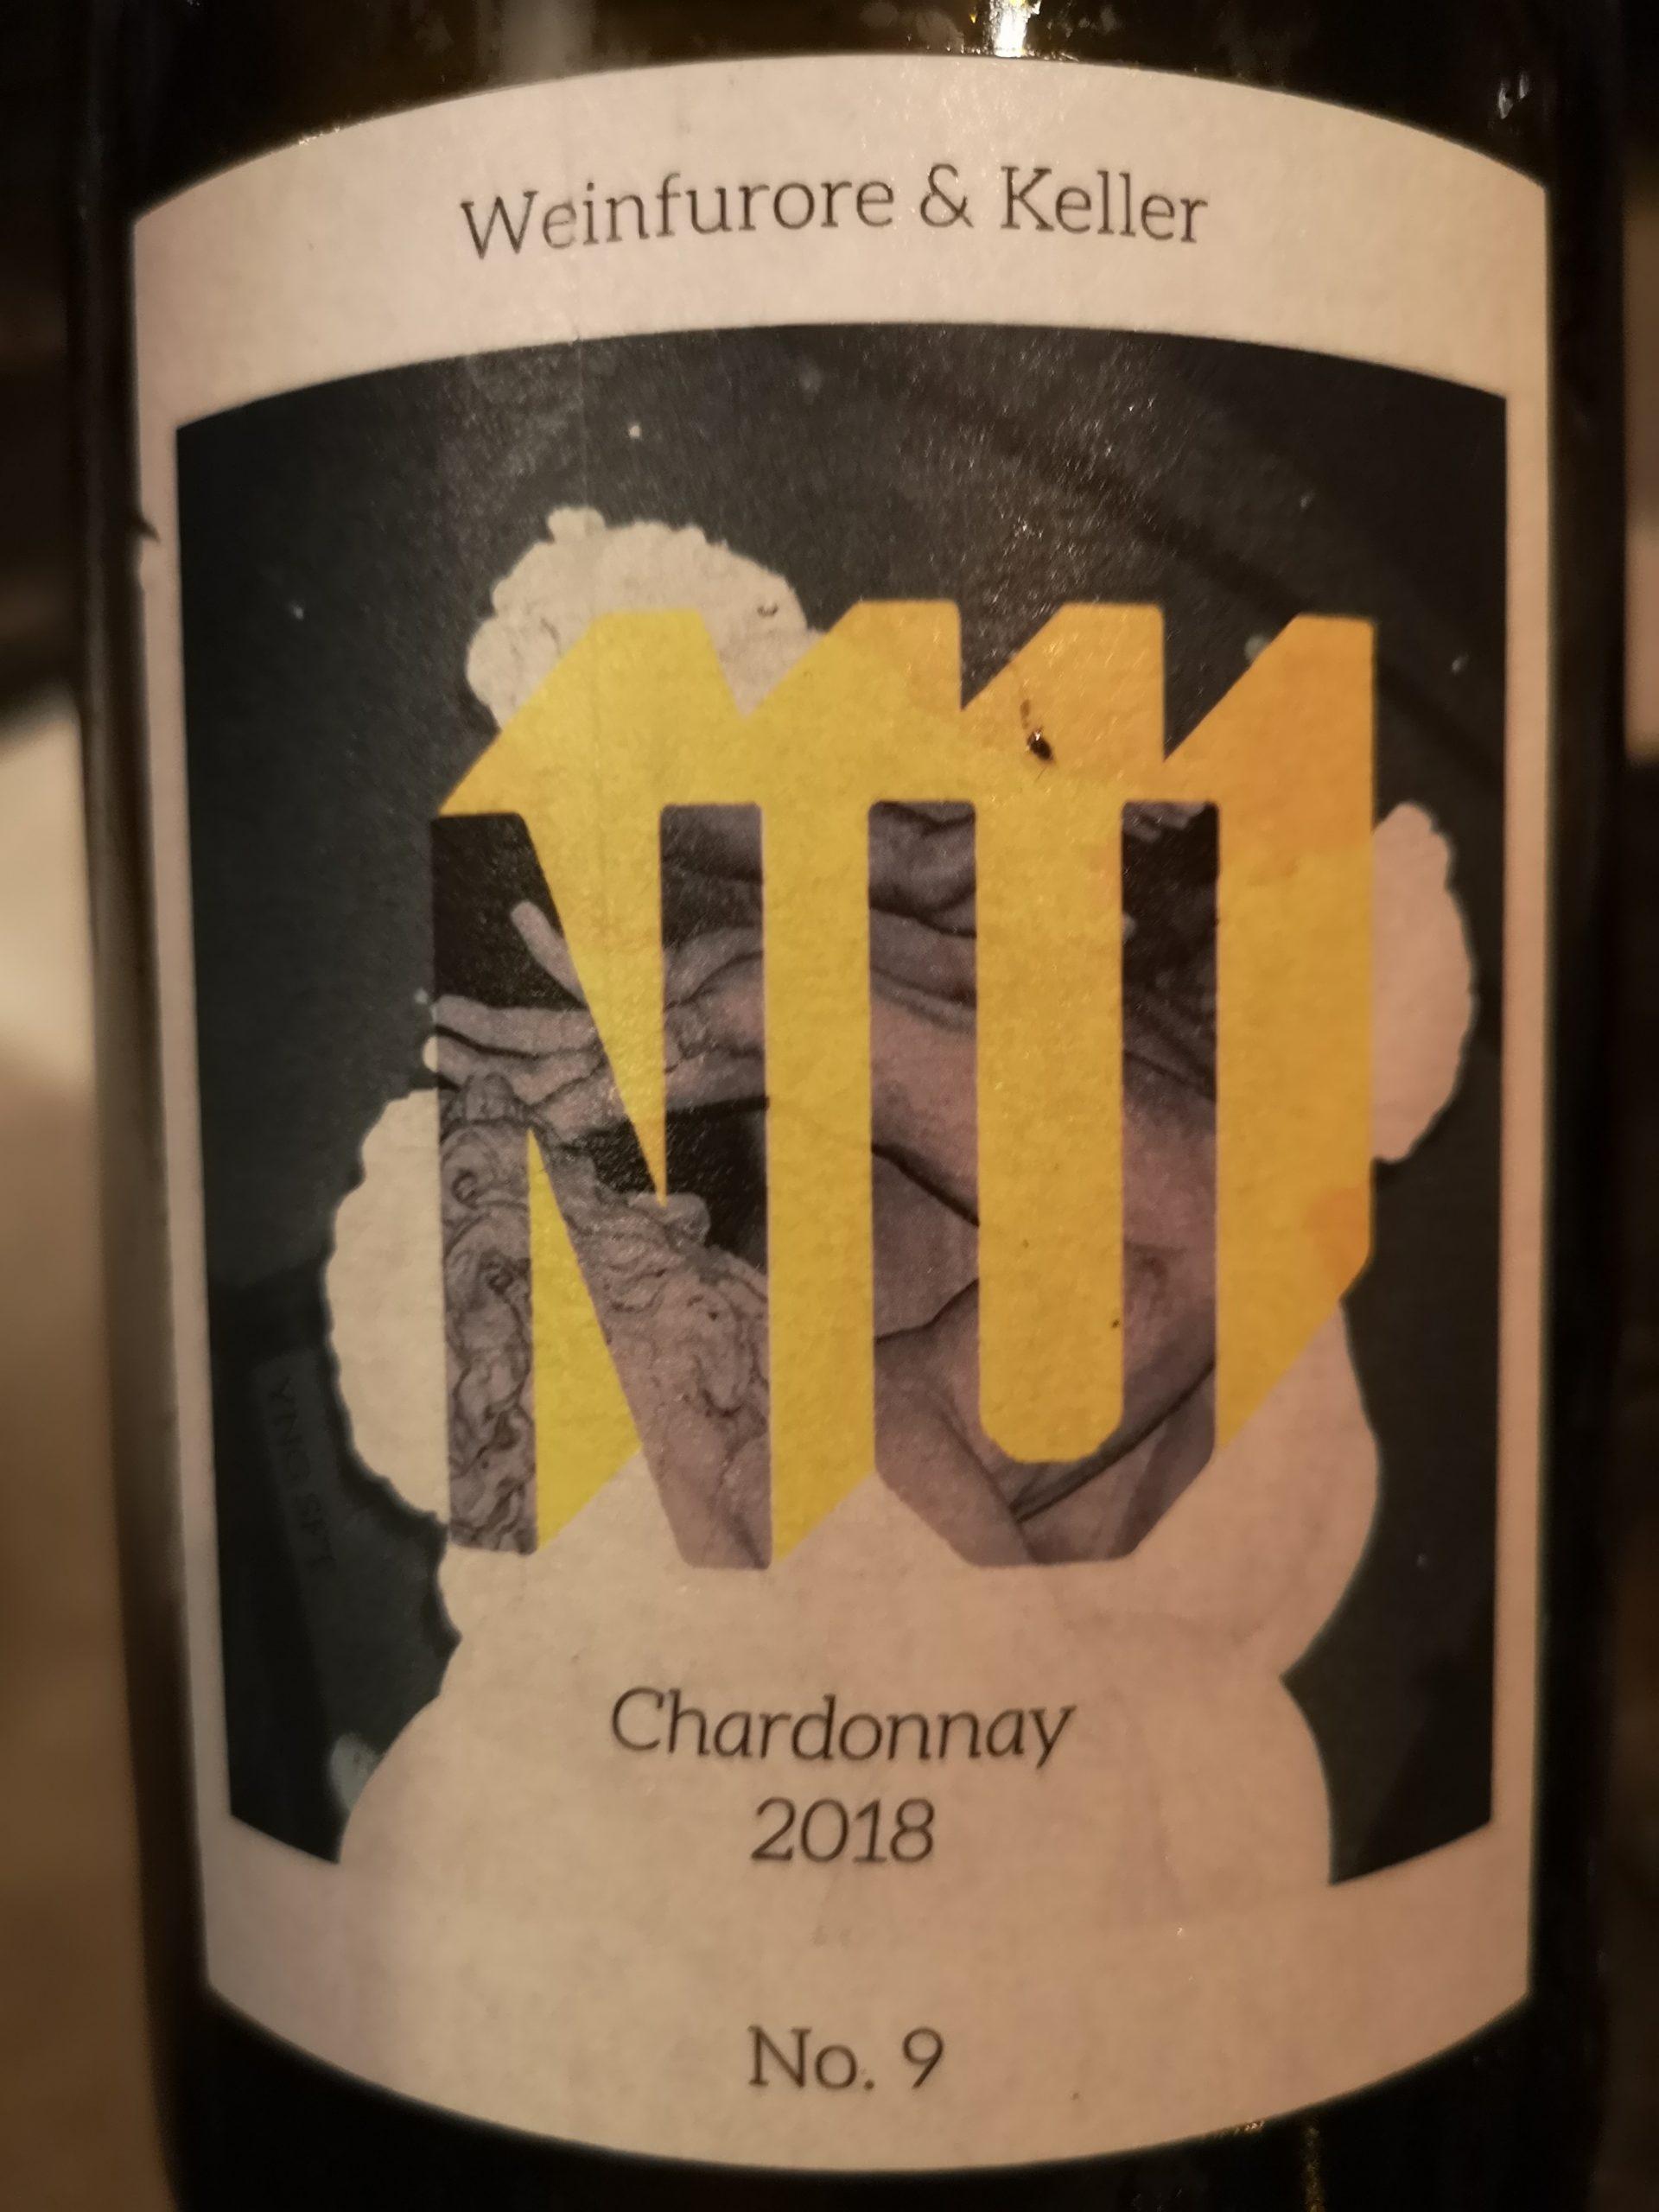 2018 Chardonnay Nu No. 9 | Keller & Weinfurore